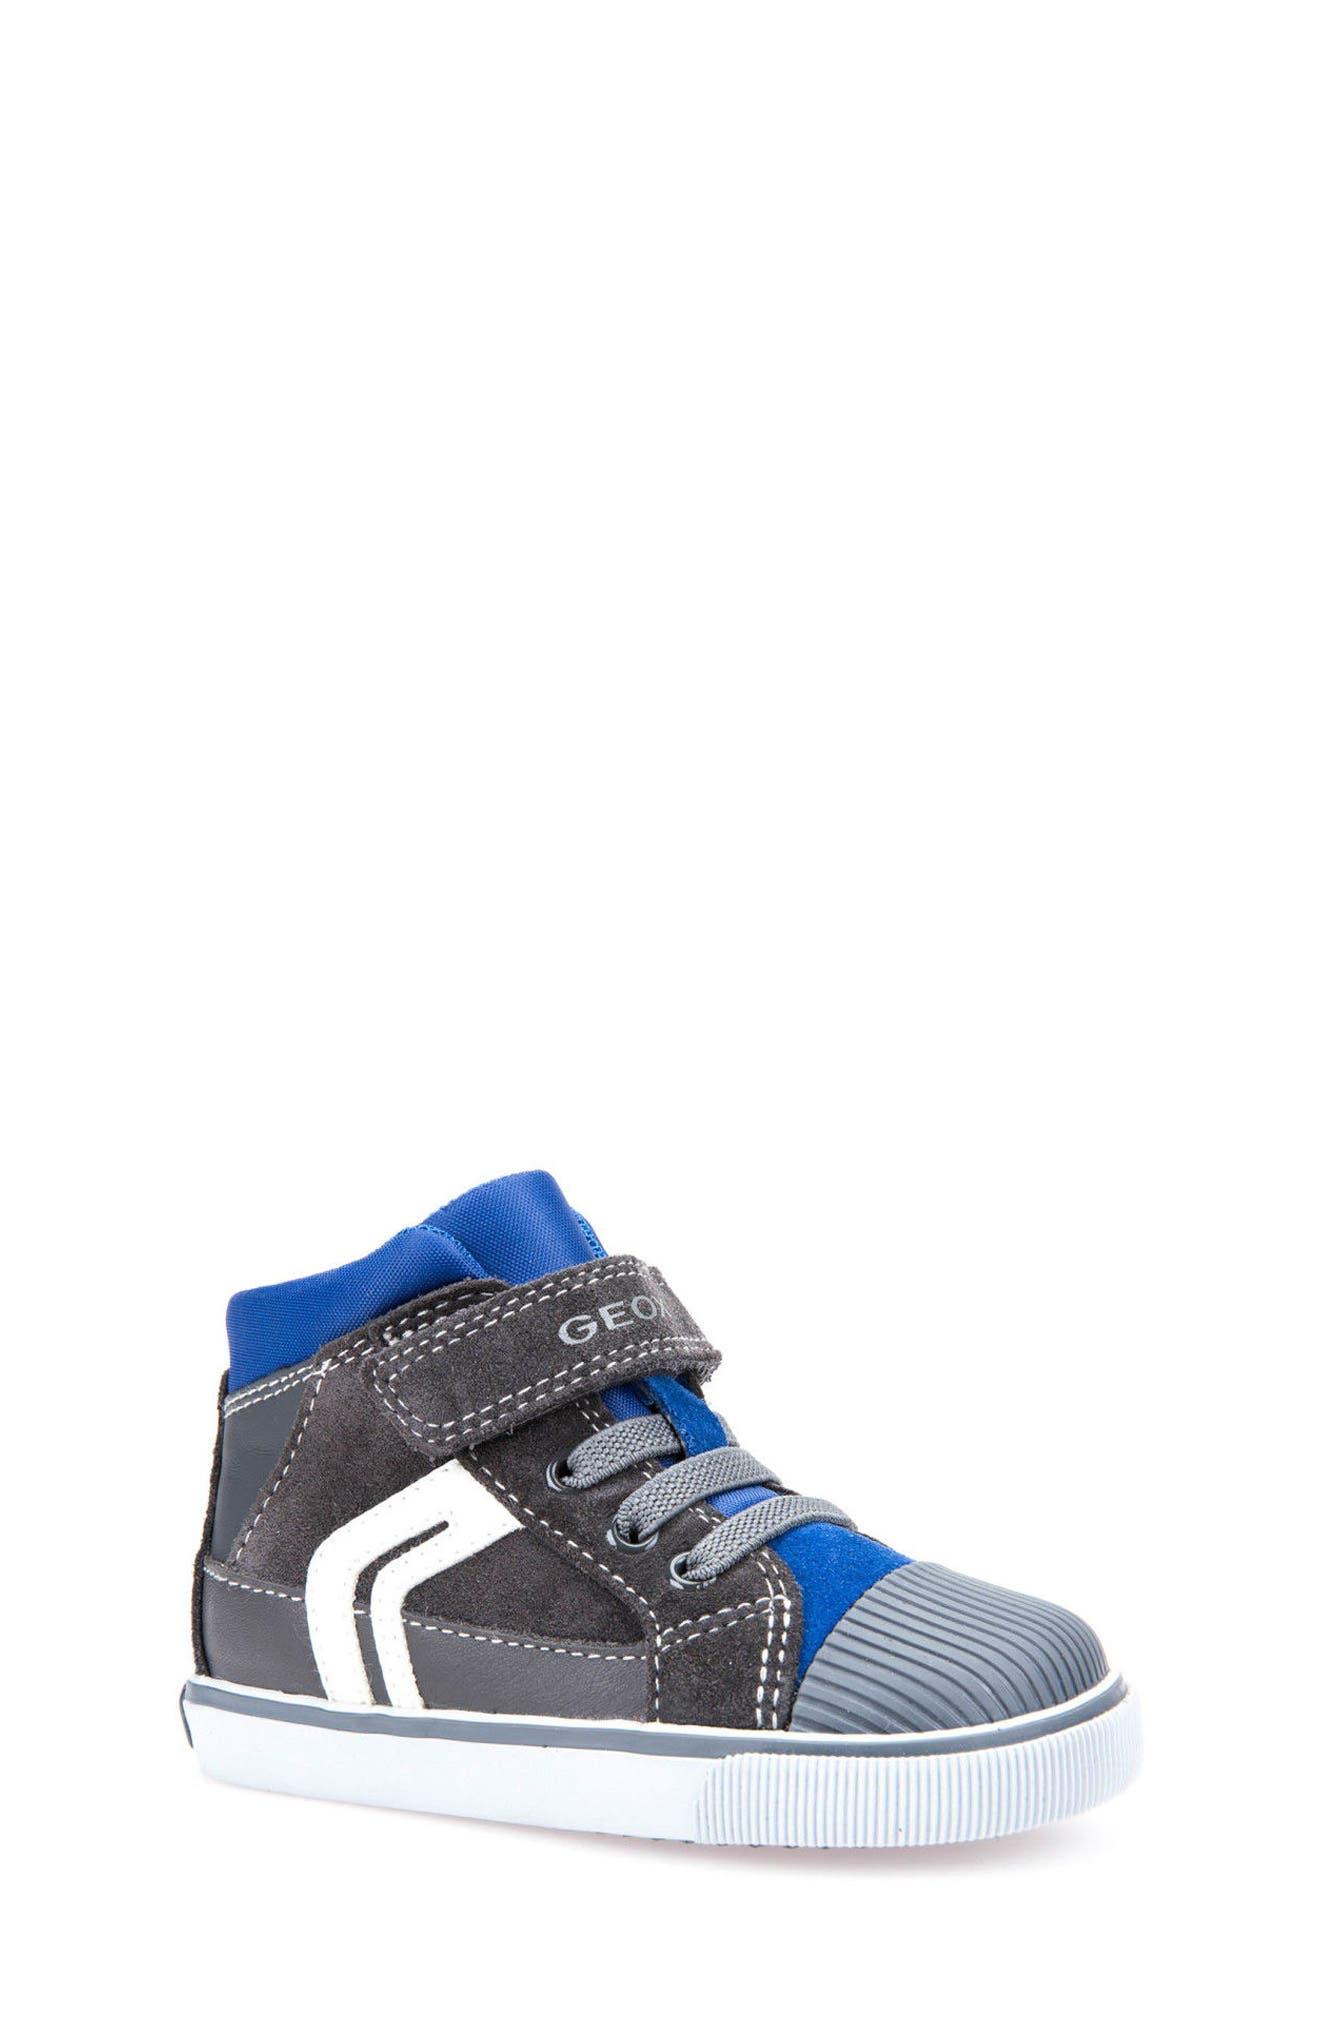 Kiwi Boy High Top Sneaker,                             Main thumbnail 1, color,                             073